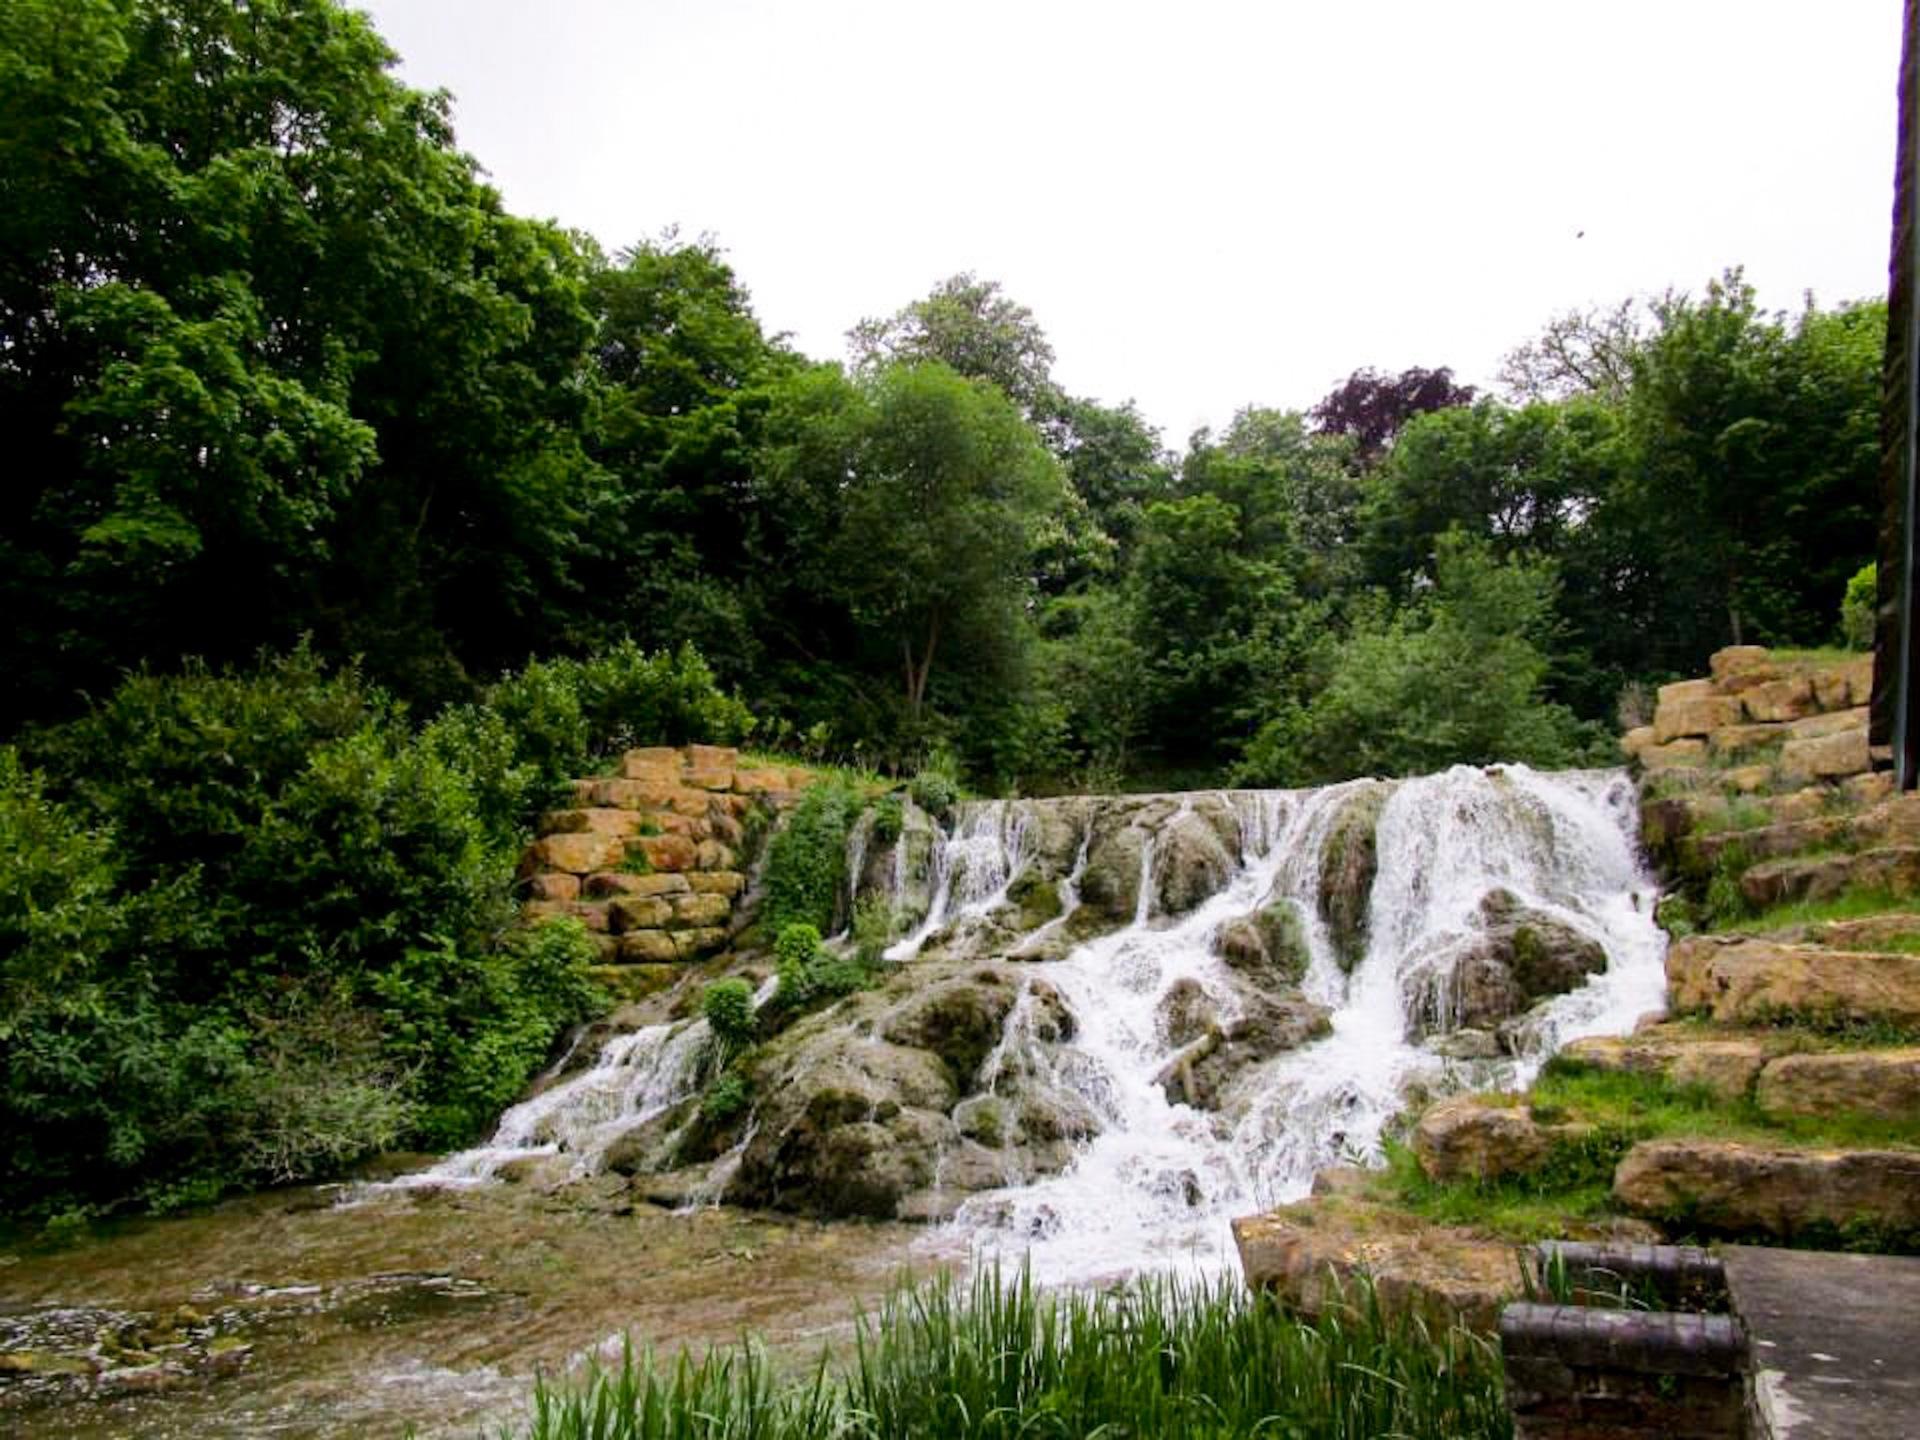 Waterfall at Blenheim palace